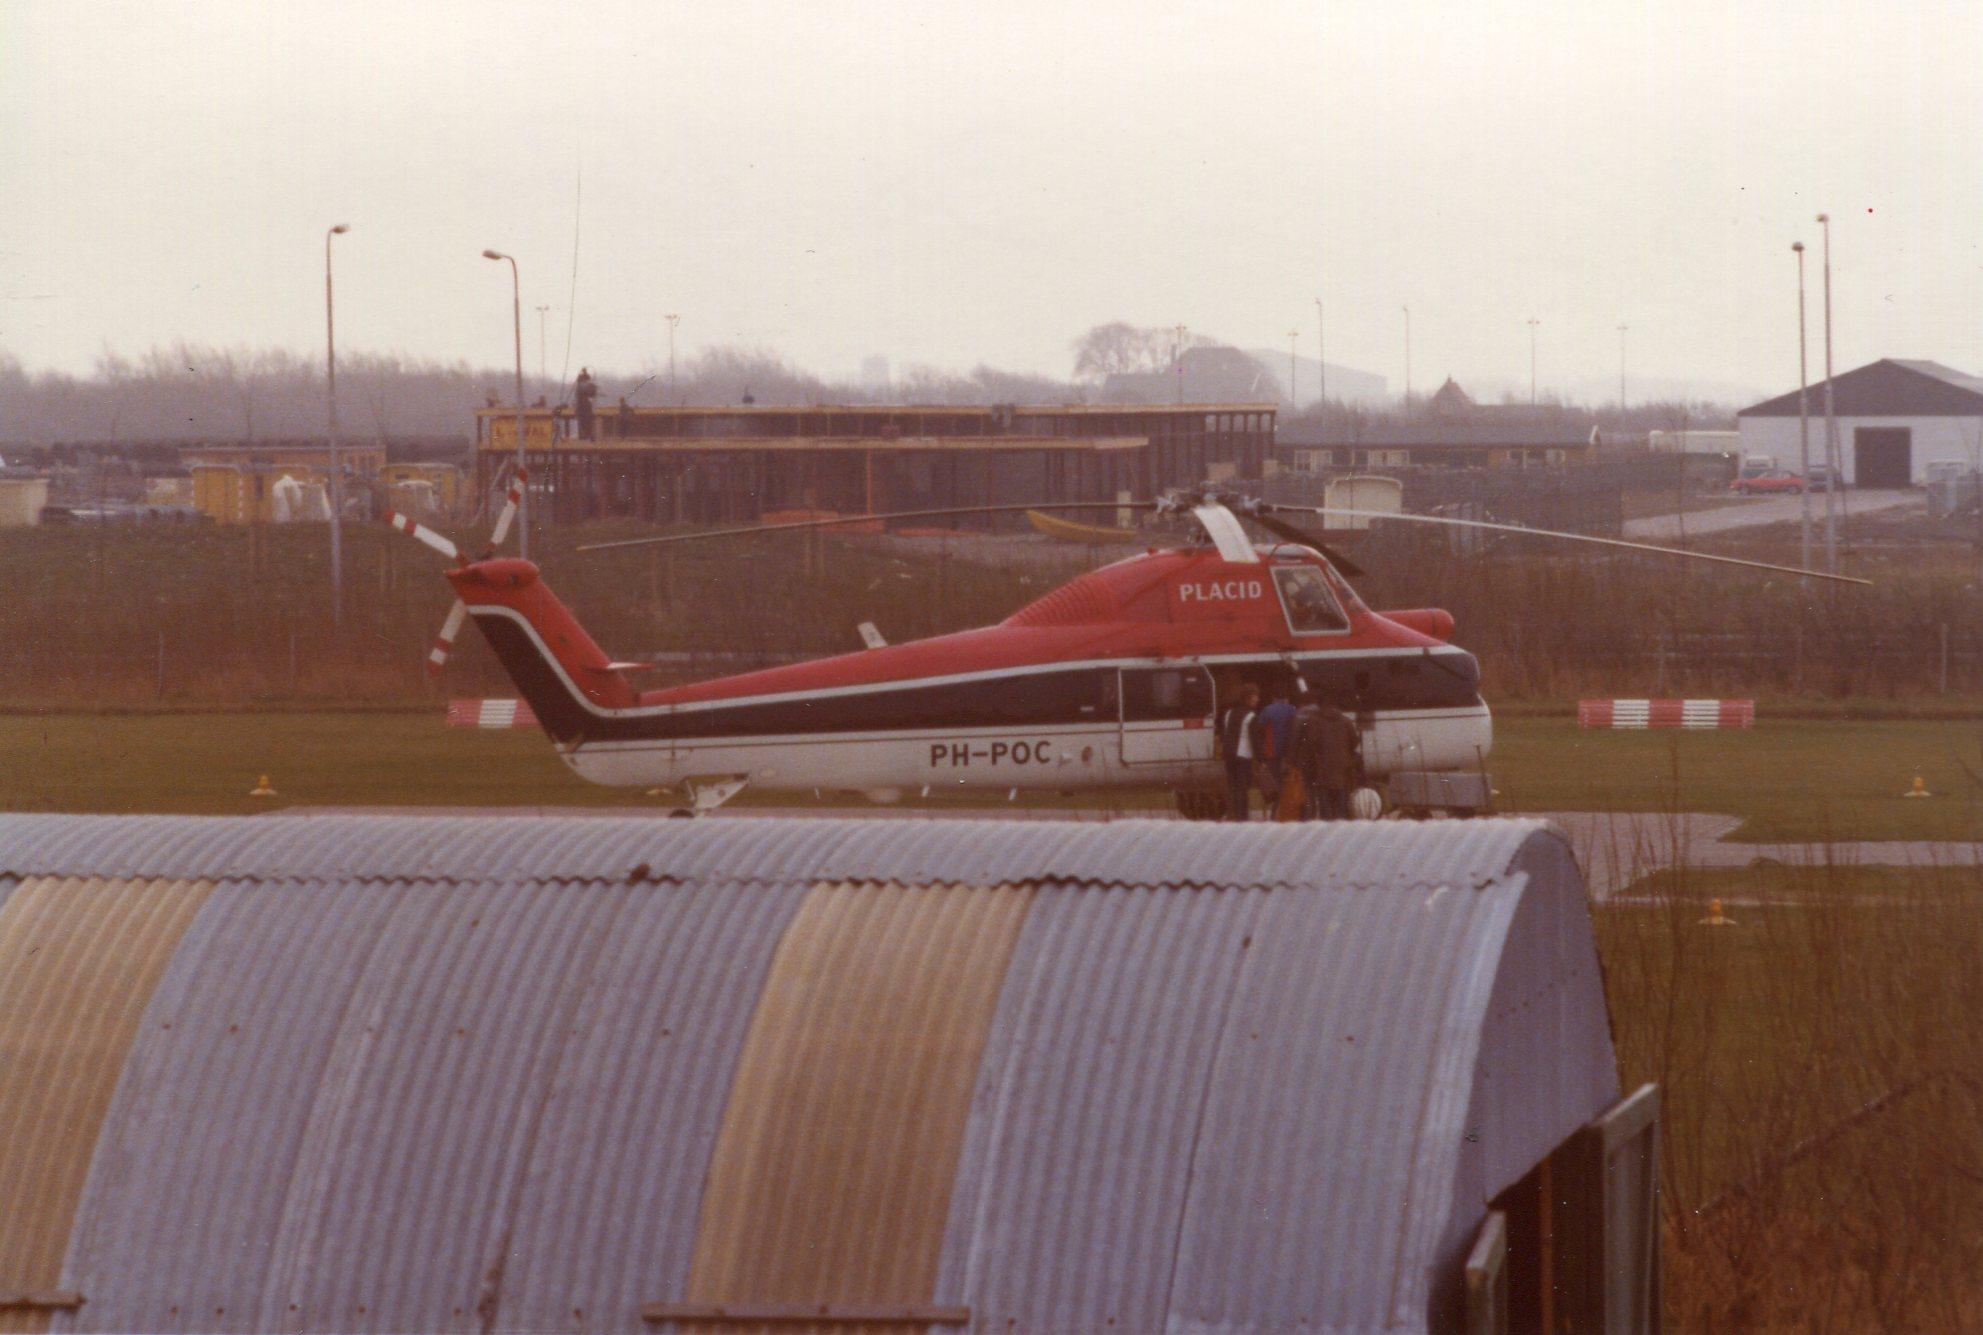 Naam: Den Helder , april 1977 (2).jpg Bekeken: 218 Grootte: 271,9 KB